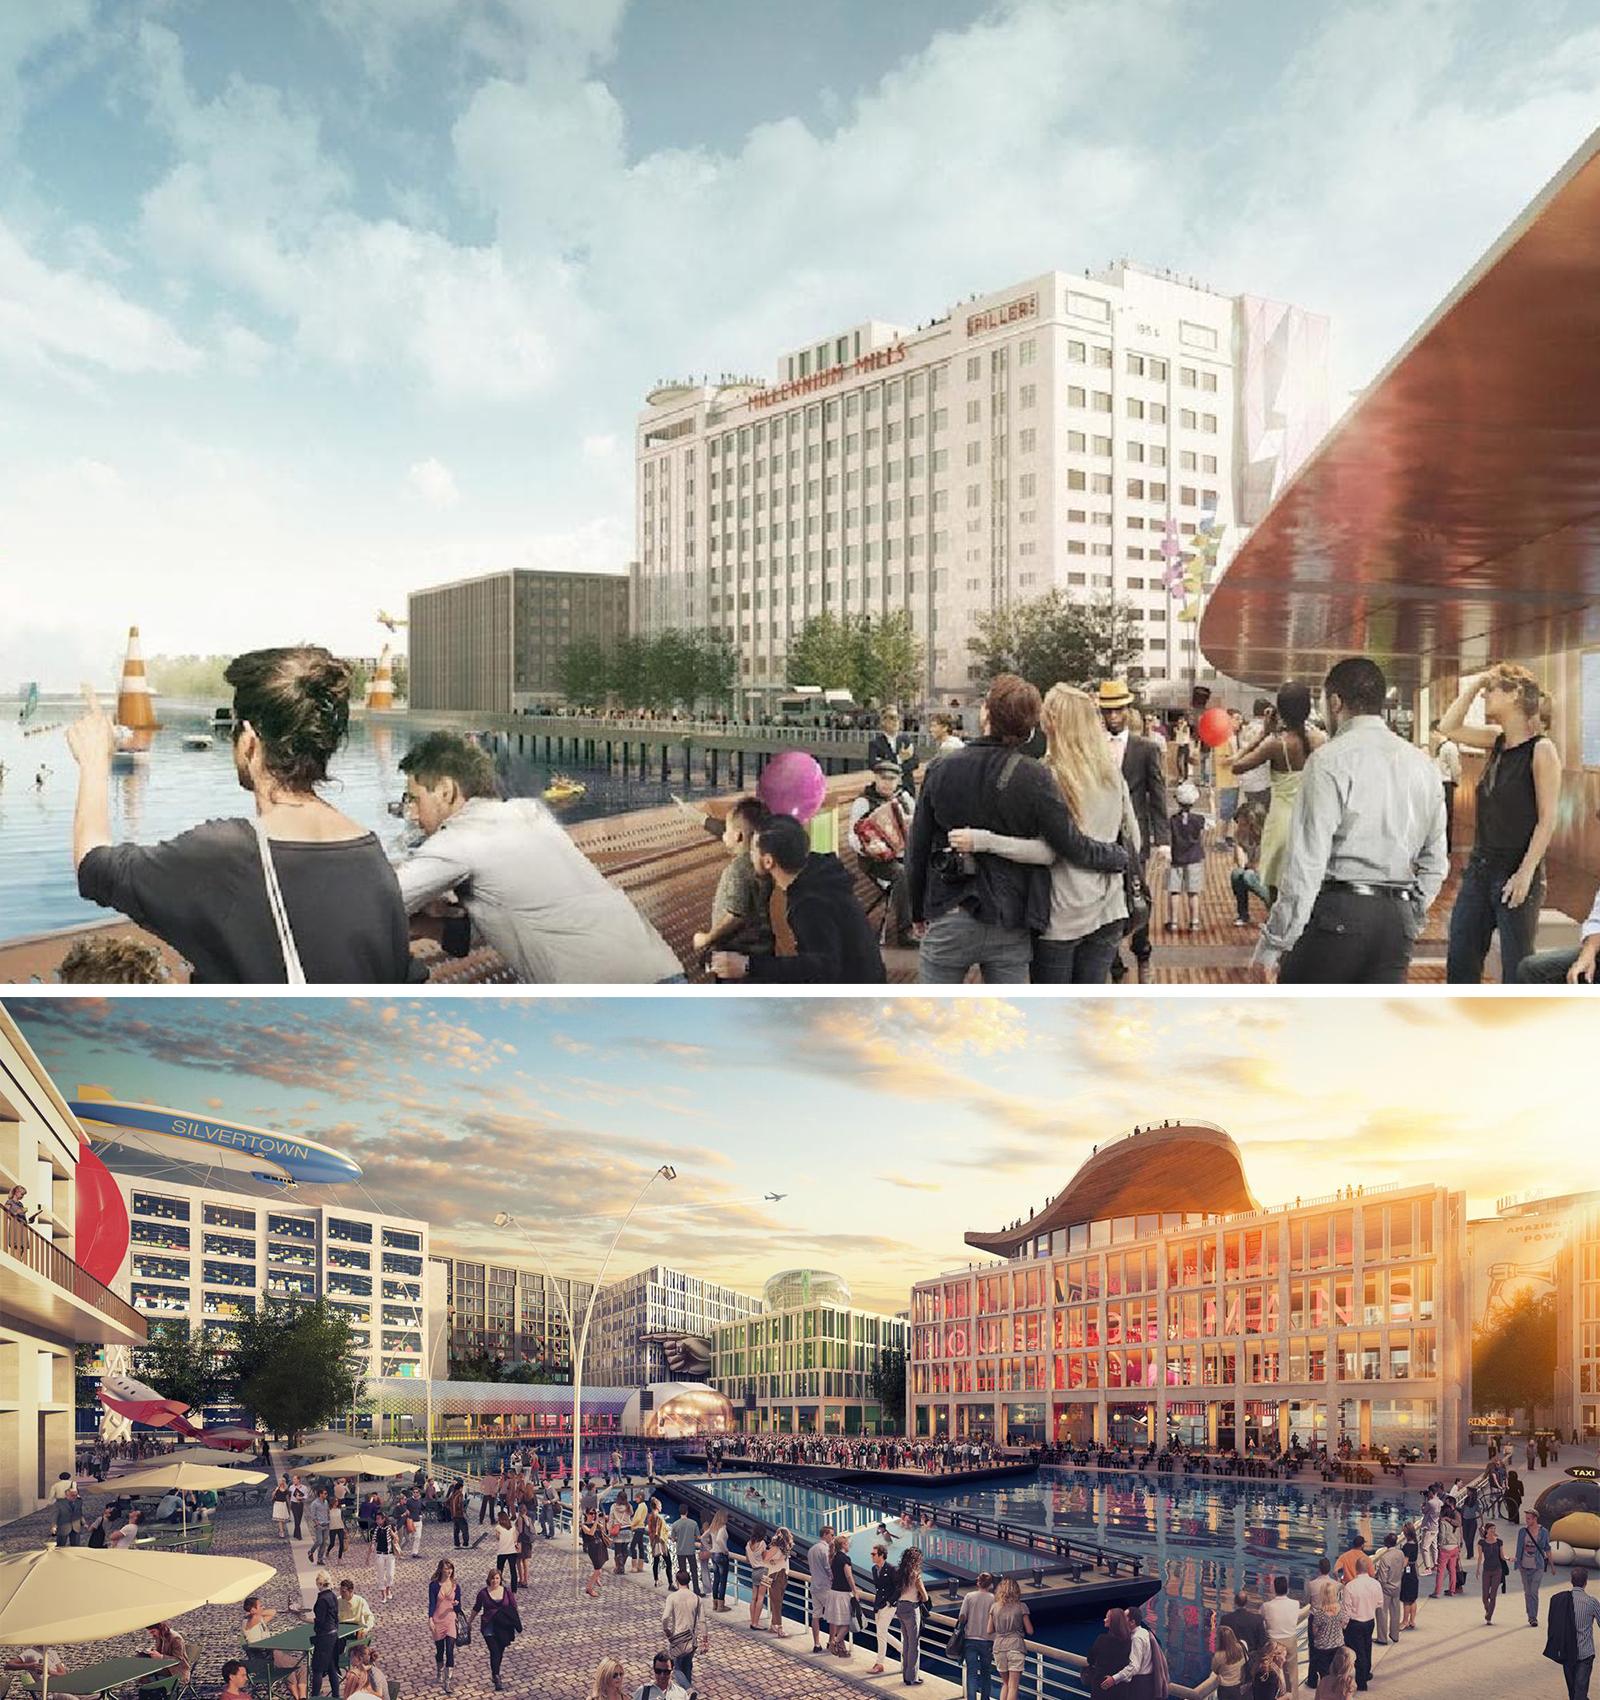 Silvertown Quays will add another £3.5 billion ($6.2 billion) in developments to Lendlease's portfolio.